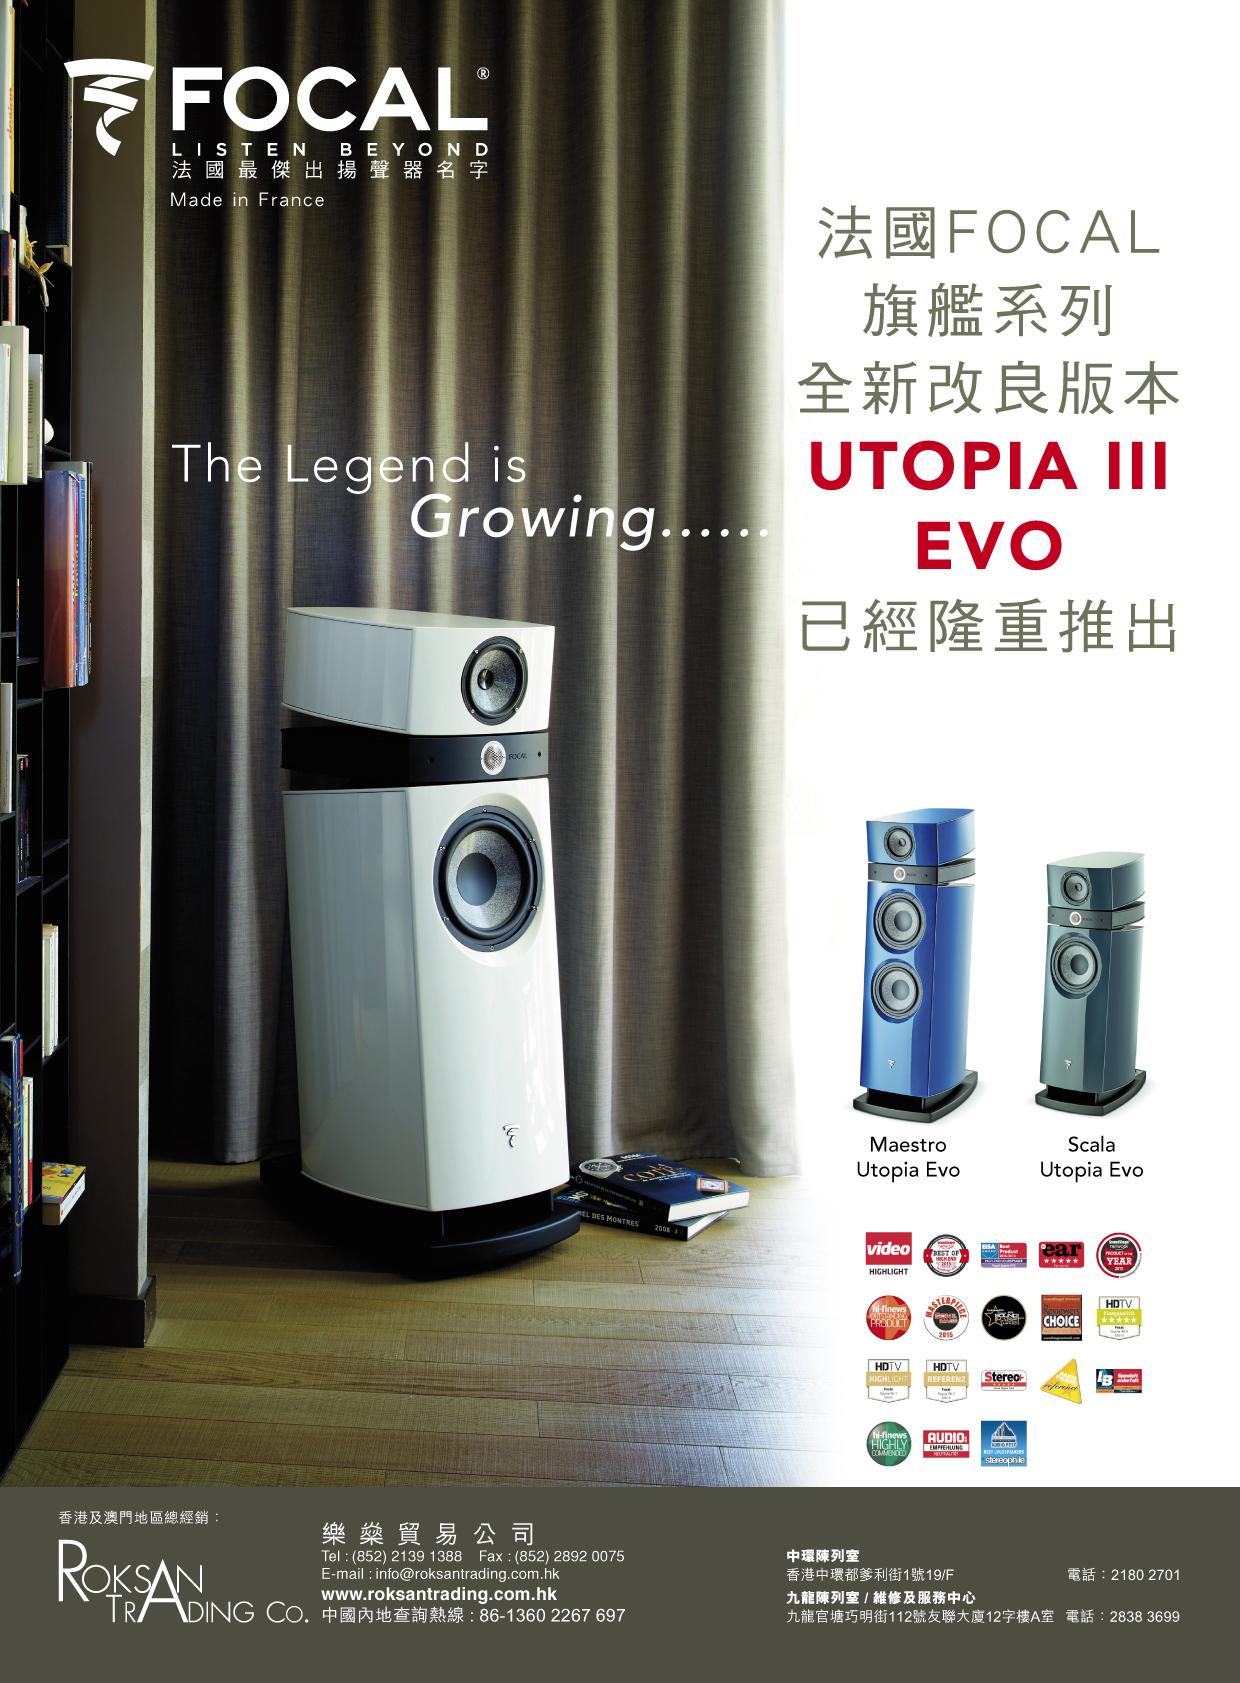 Focal-utopia 3 evo